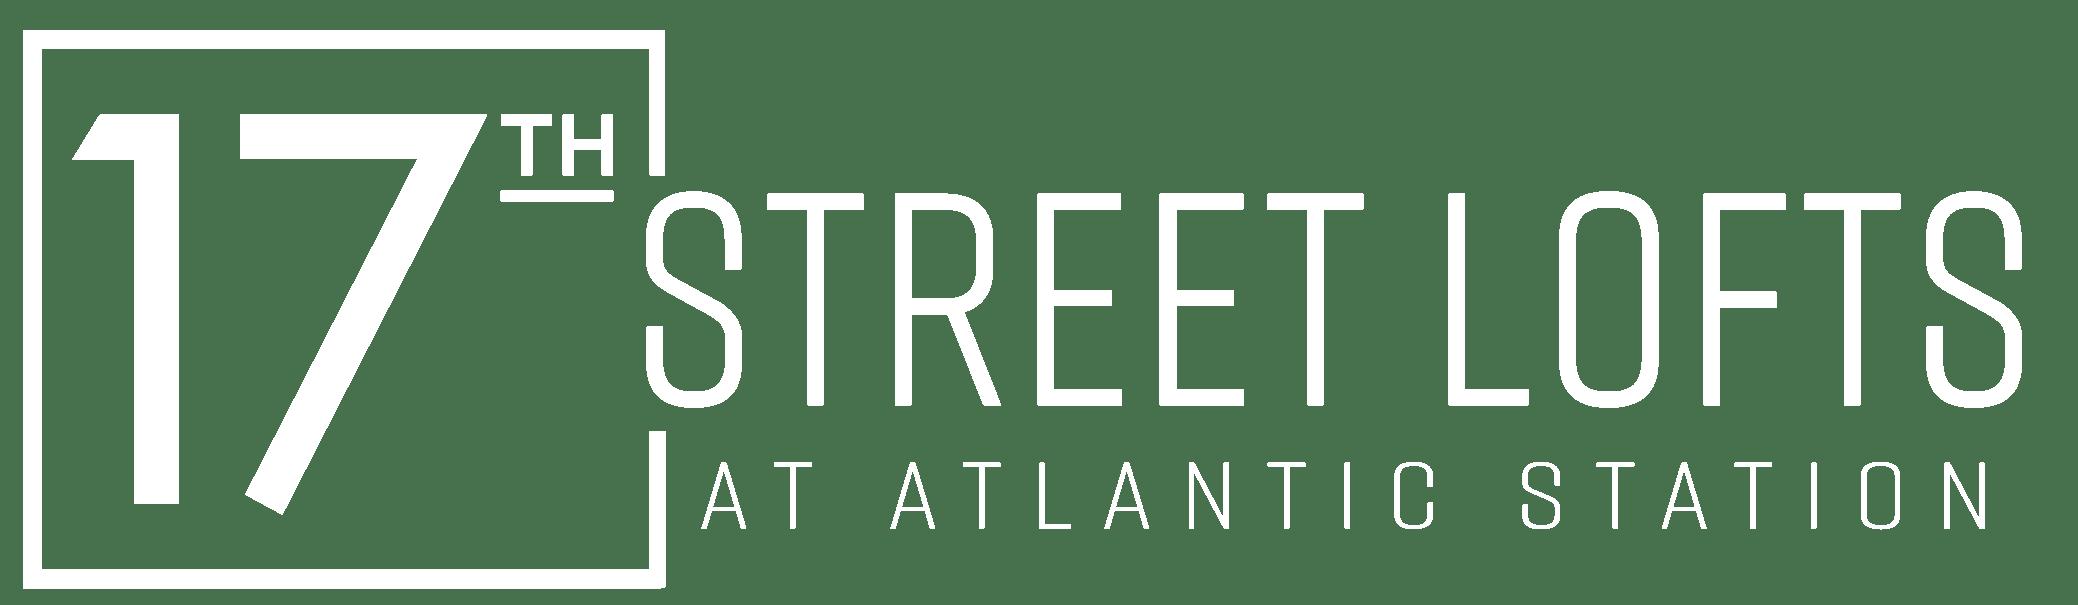 17th Street Lofts logo